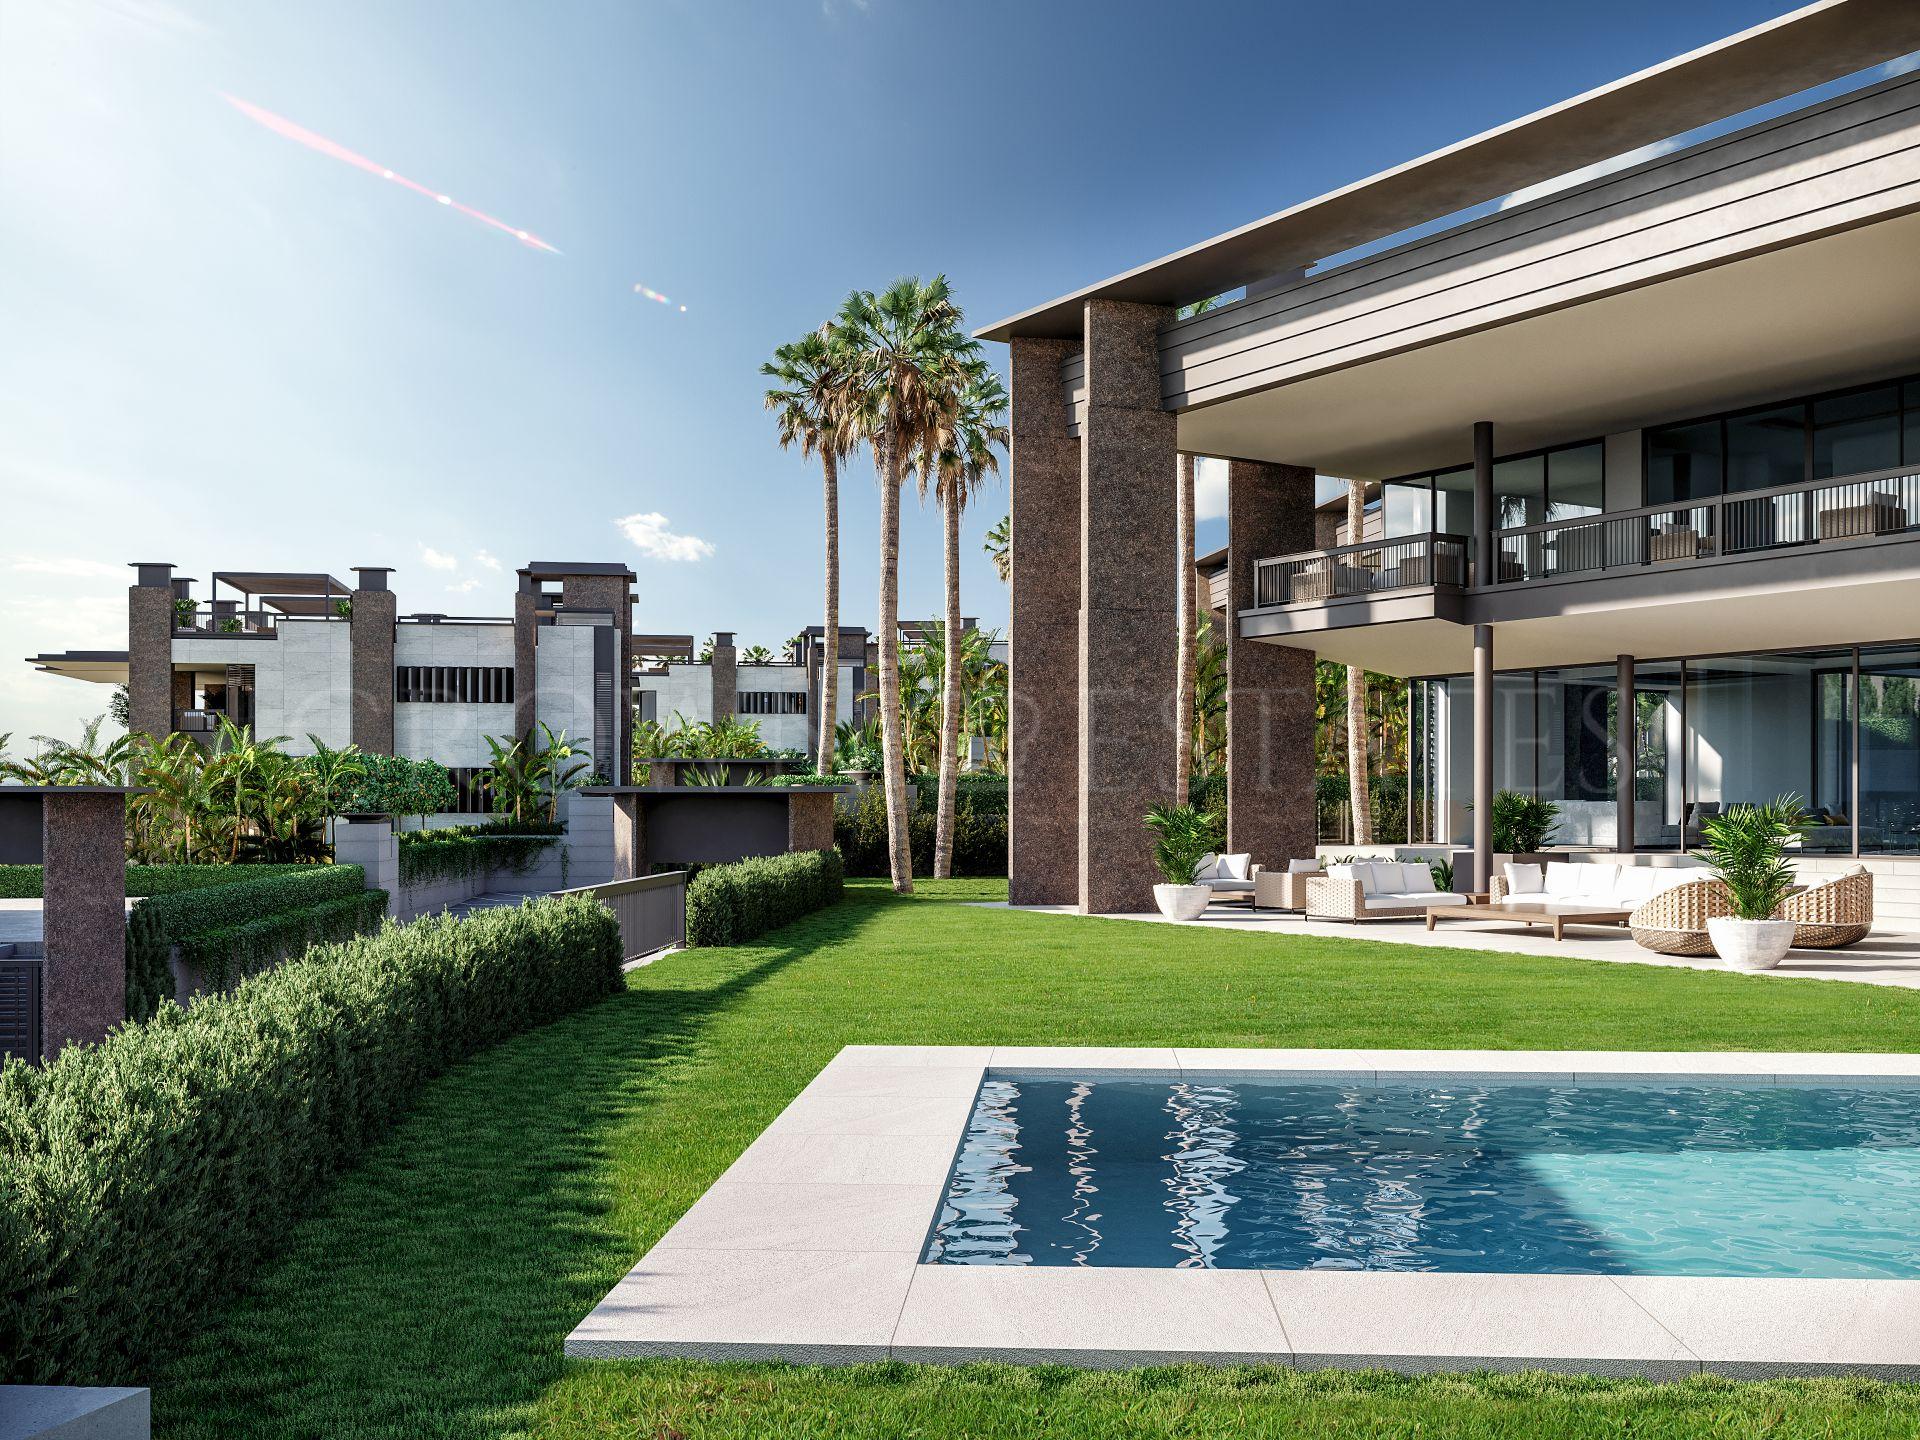 Los Palacetes de Banus, 8 stunning and elegant villas walking distance to Puerto Banús.